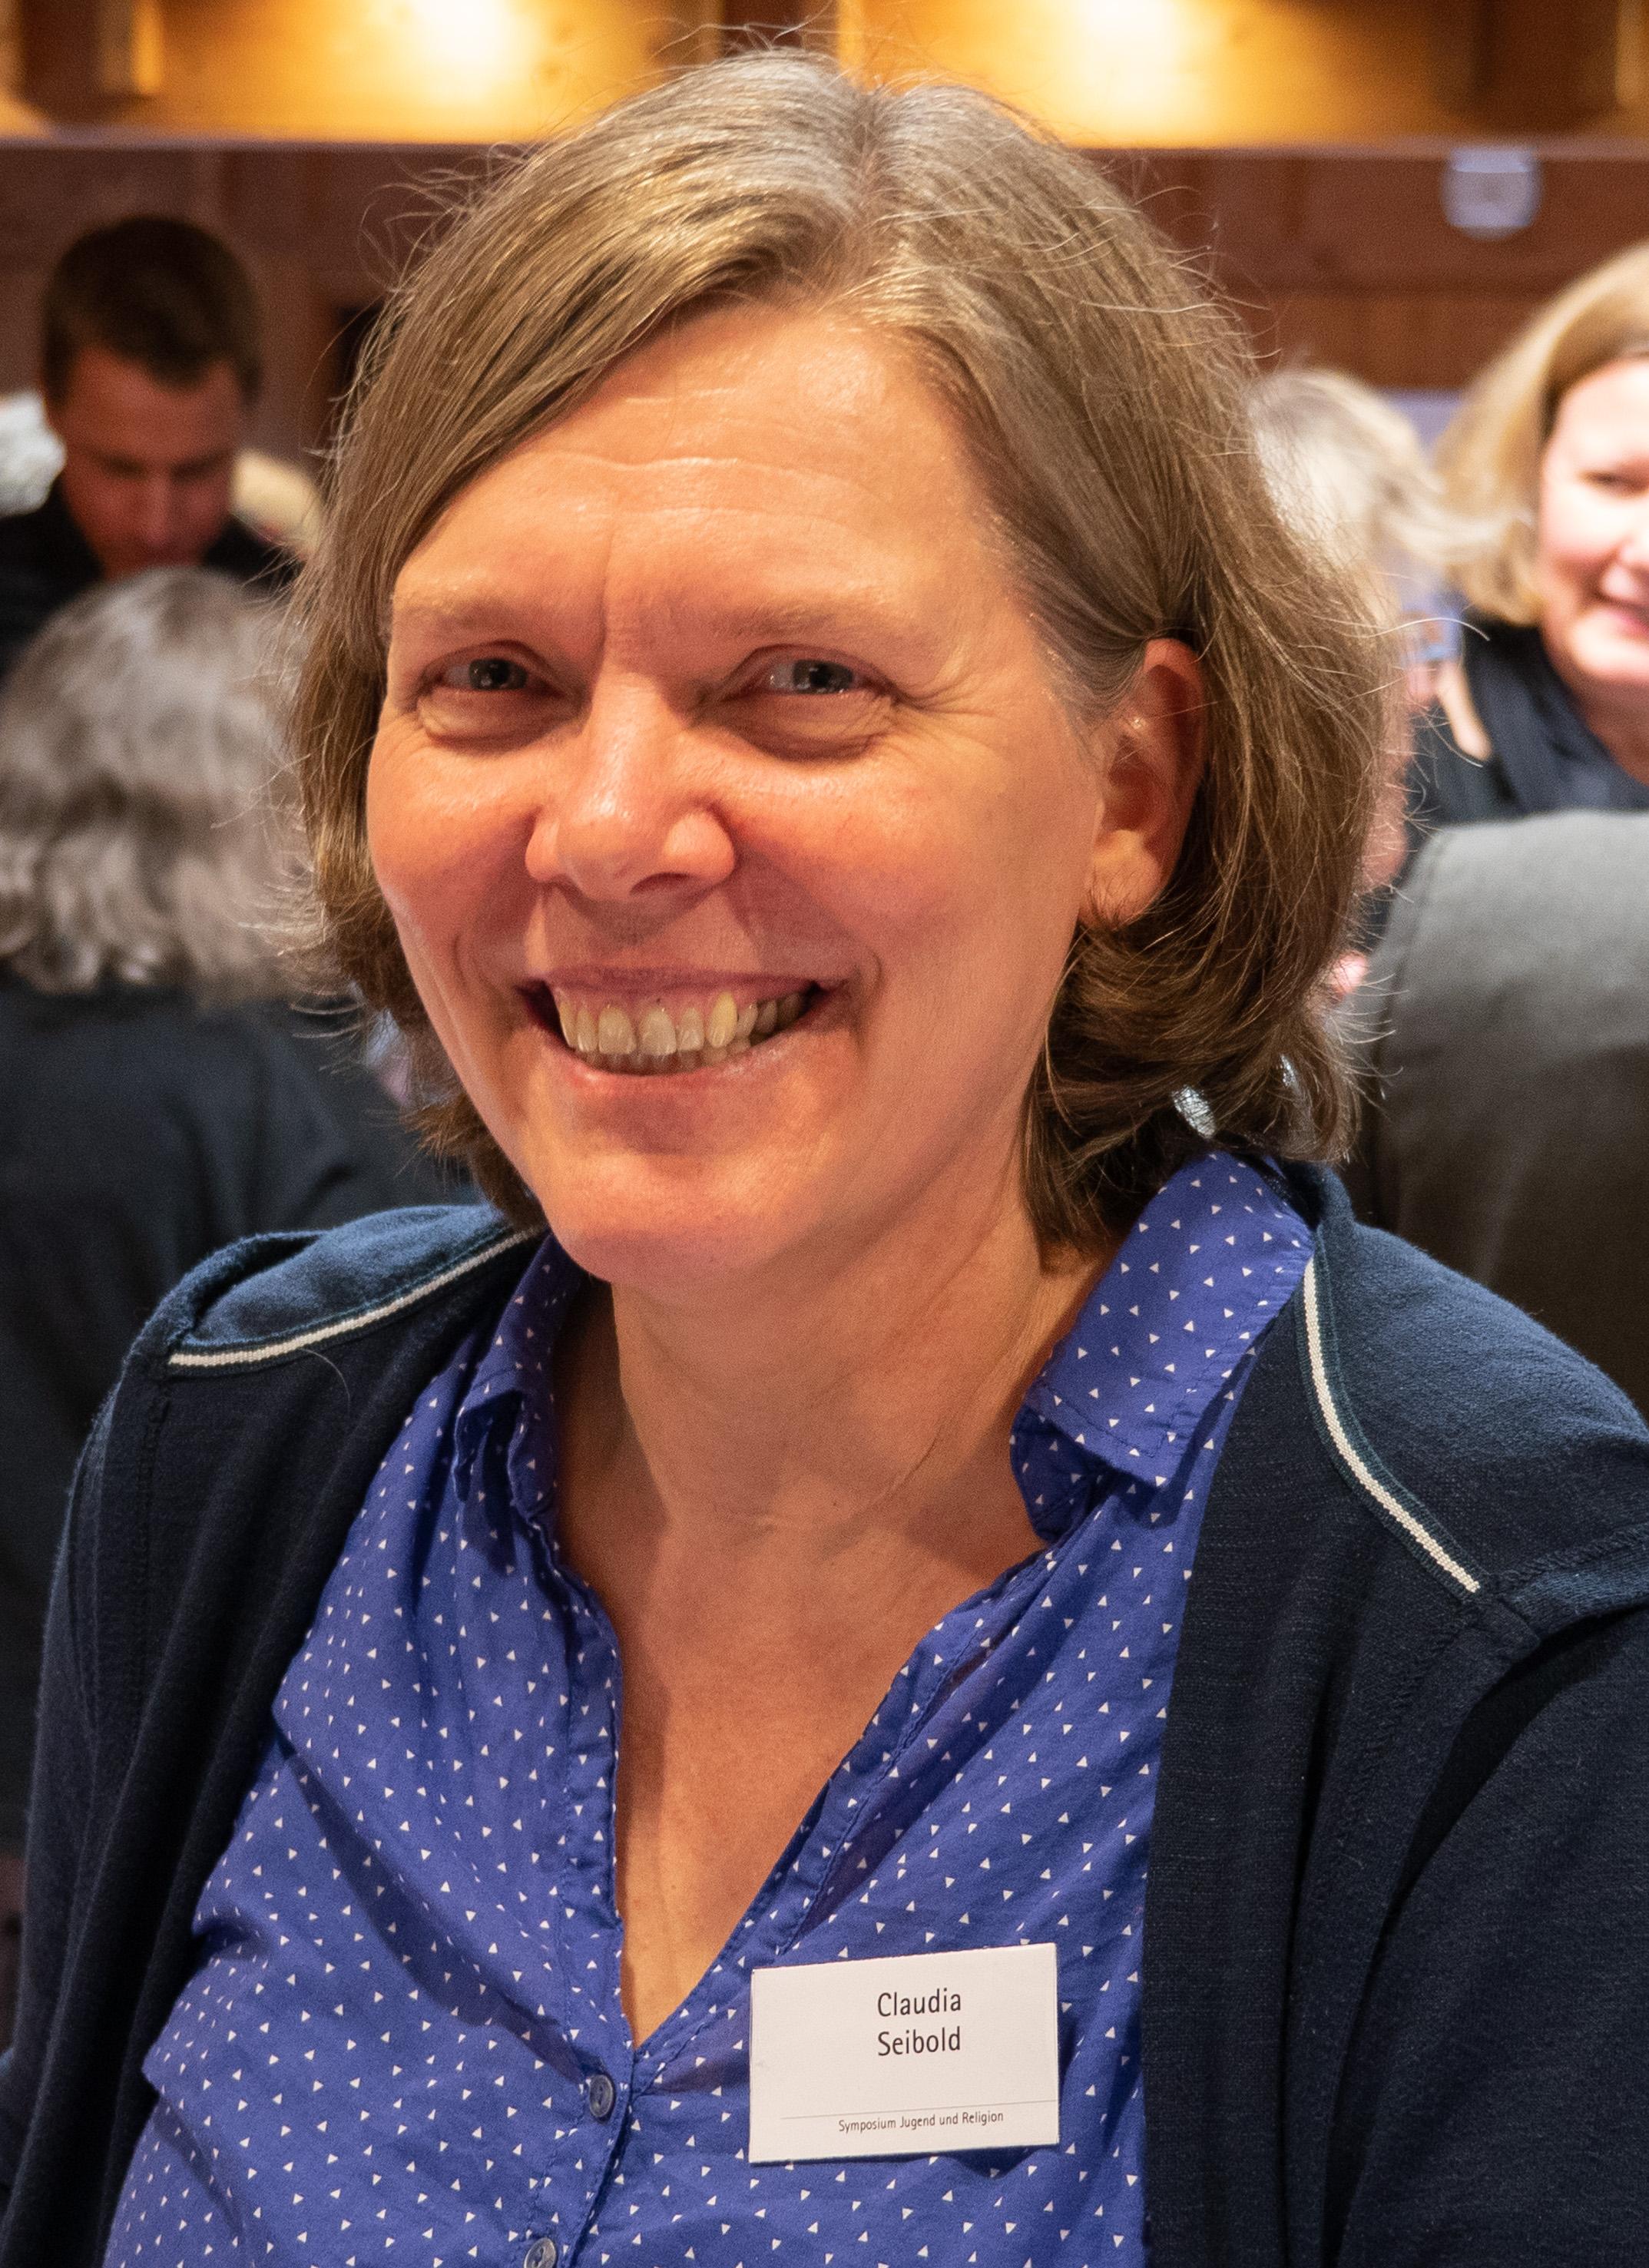 Claudia Seibold, BAG EJSA